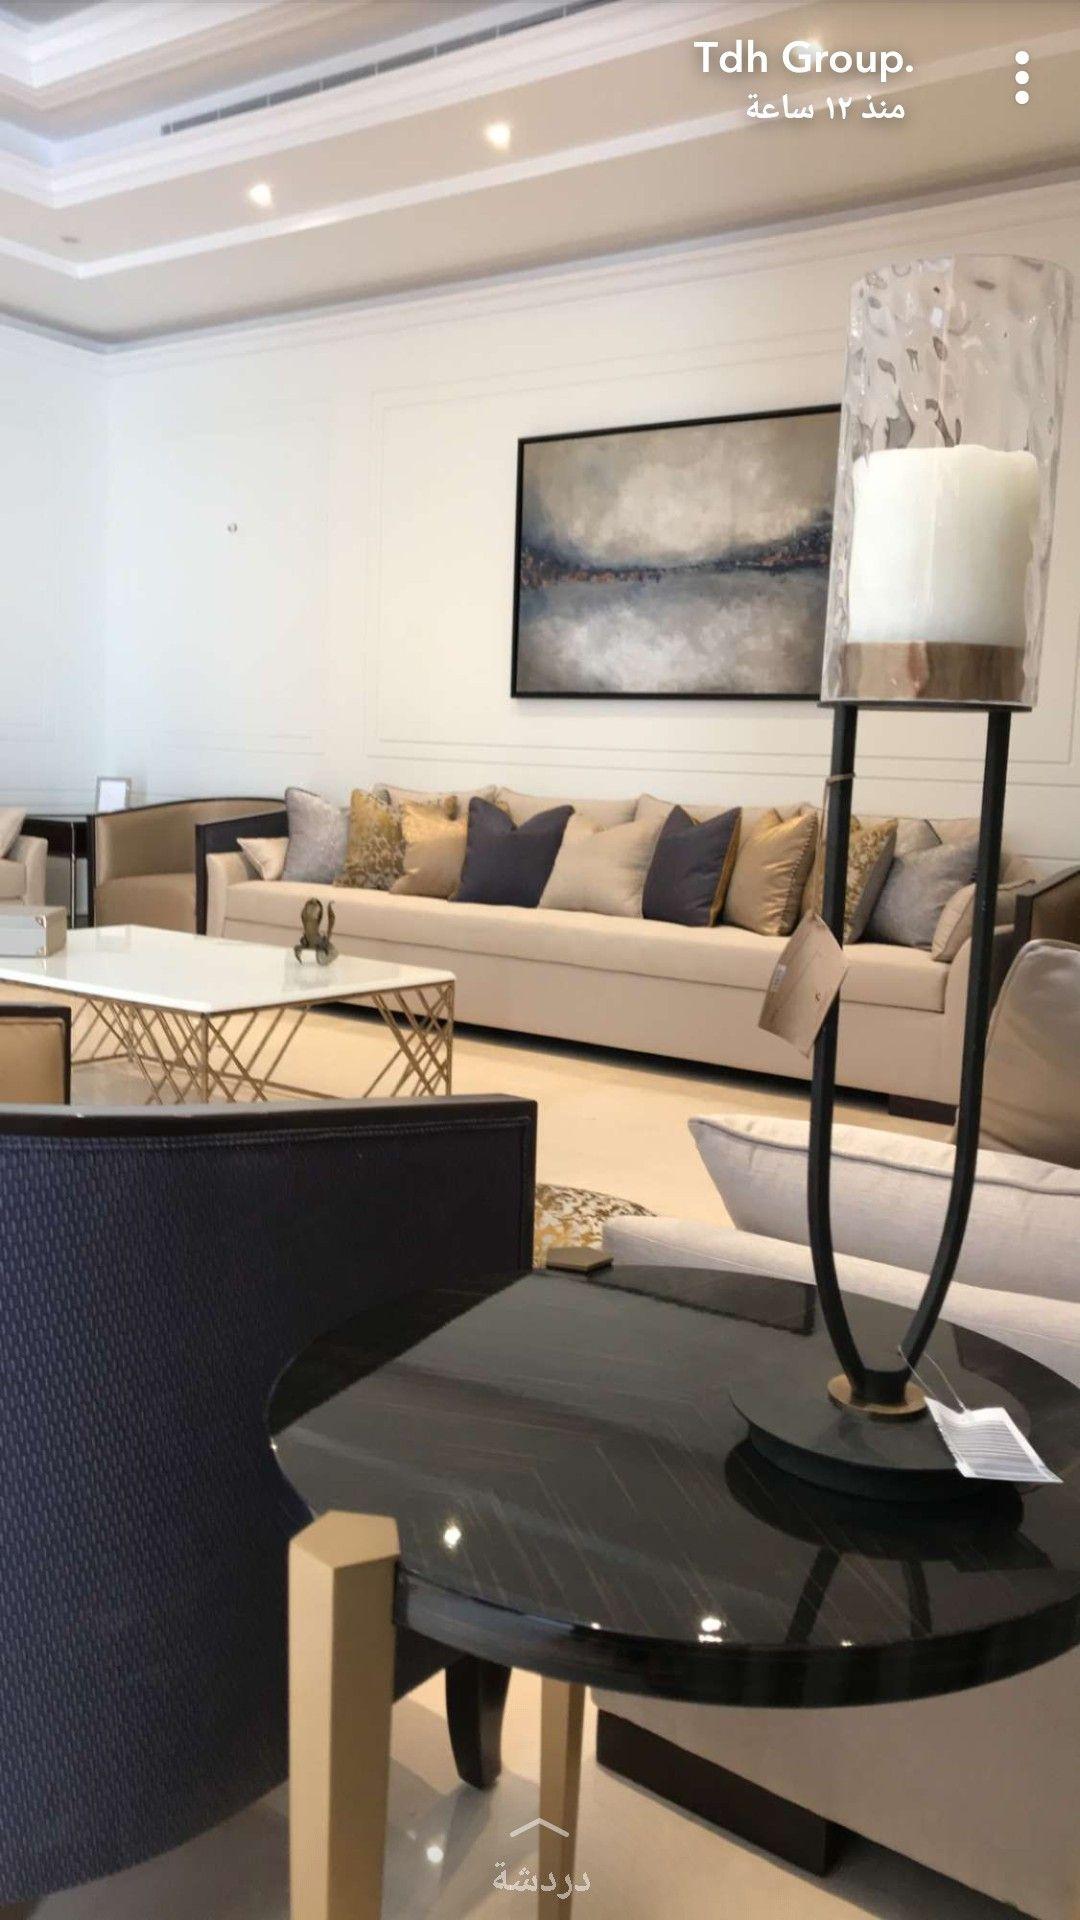 الوان الكنب Home Room Design Living Room Decor Living Room Decor Cozy